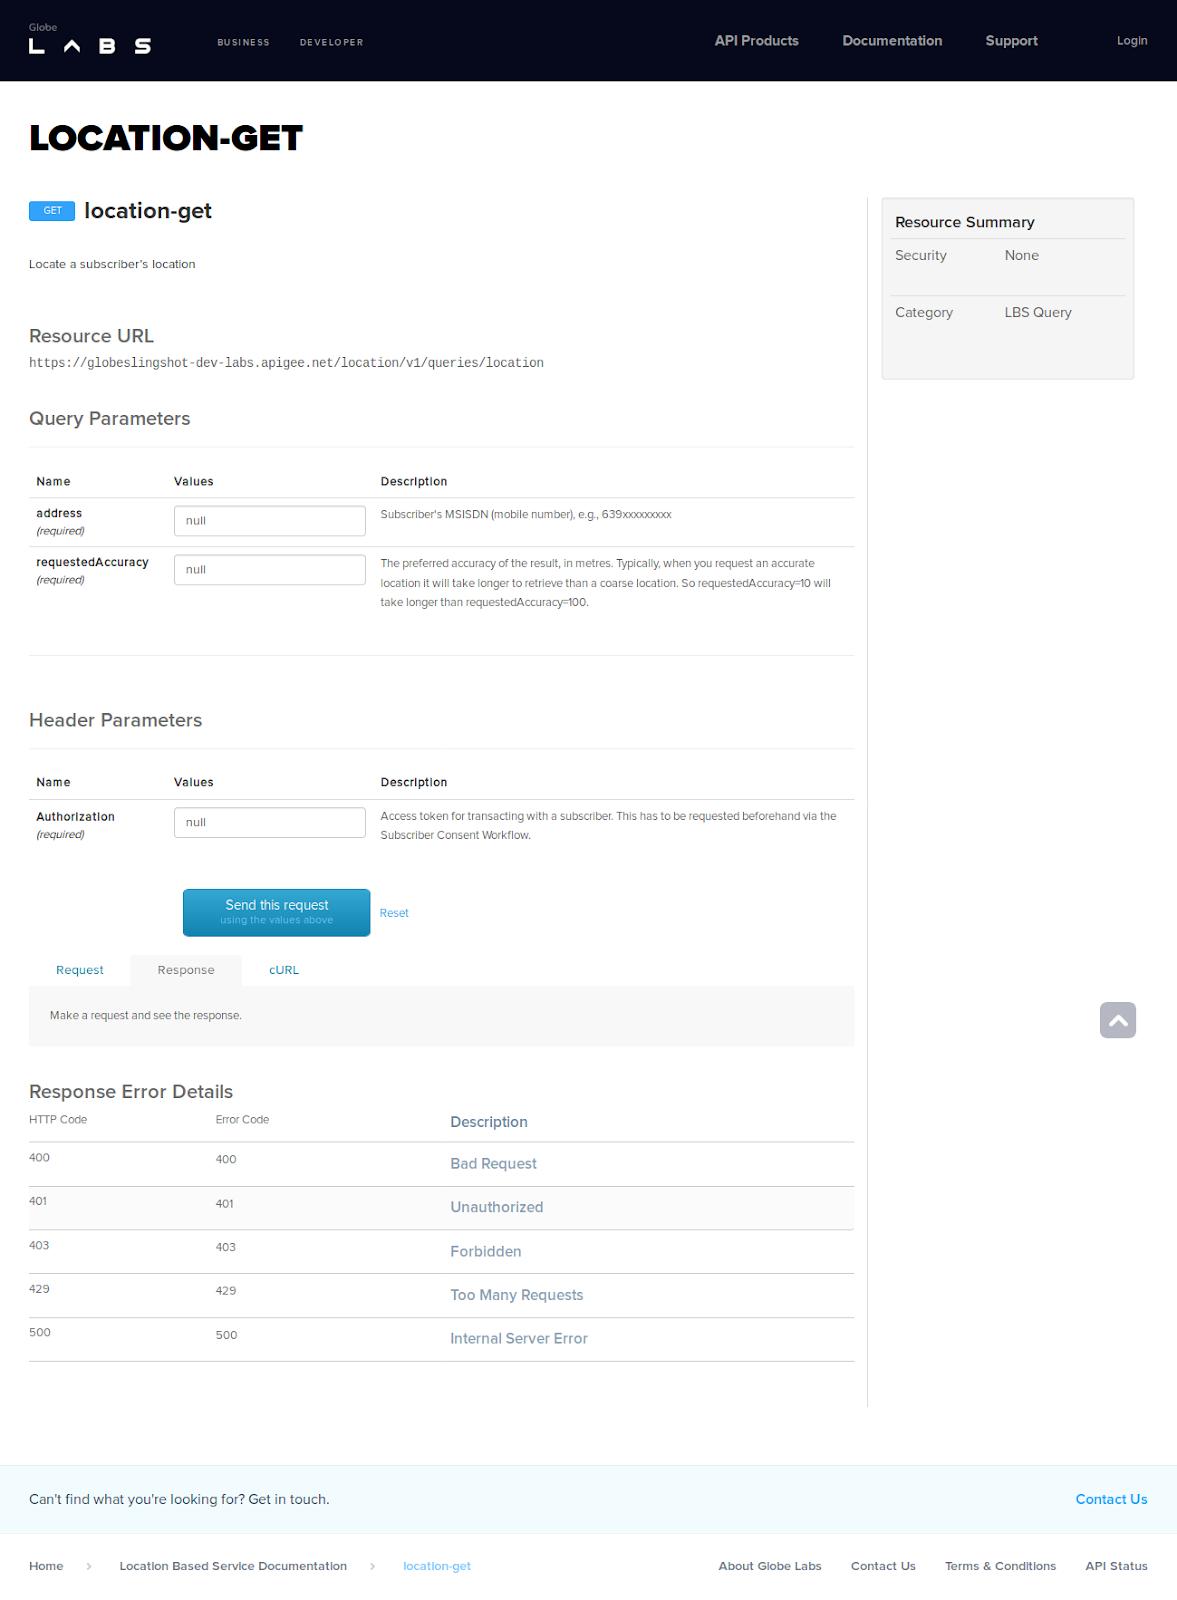 GlobeLabs SmartDocs for an API